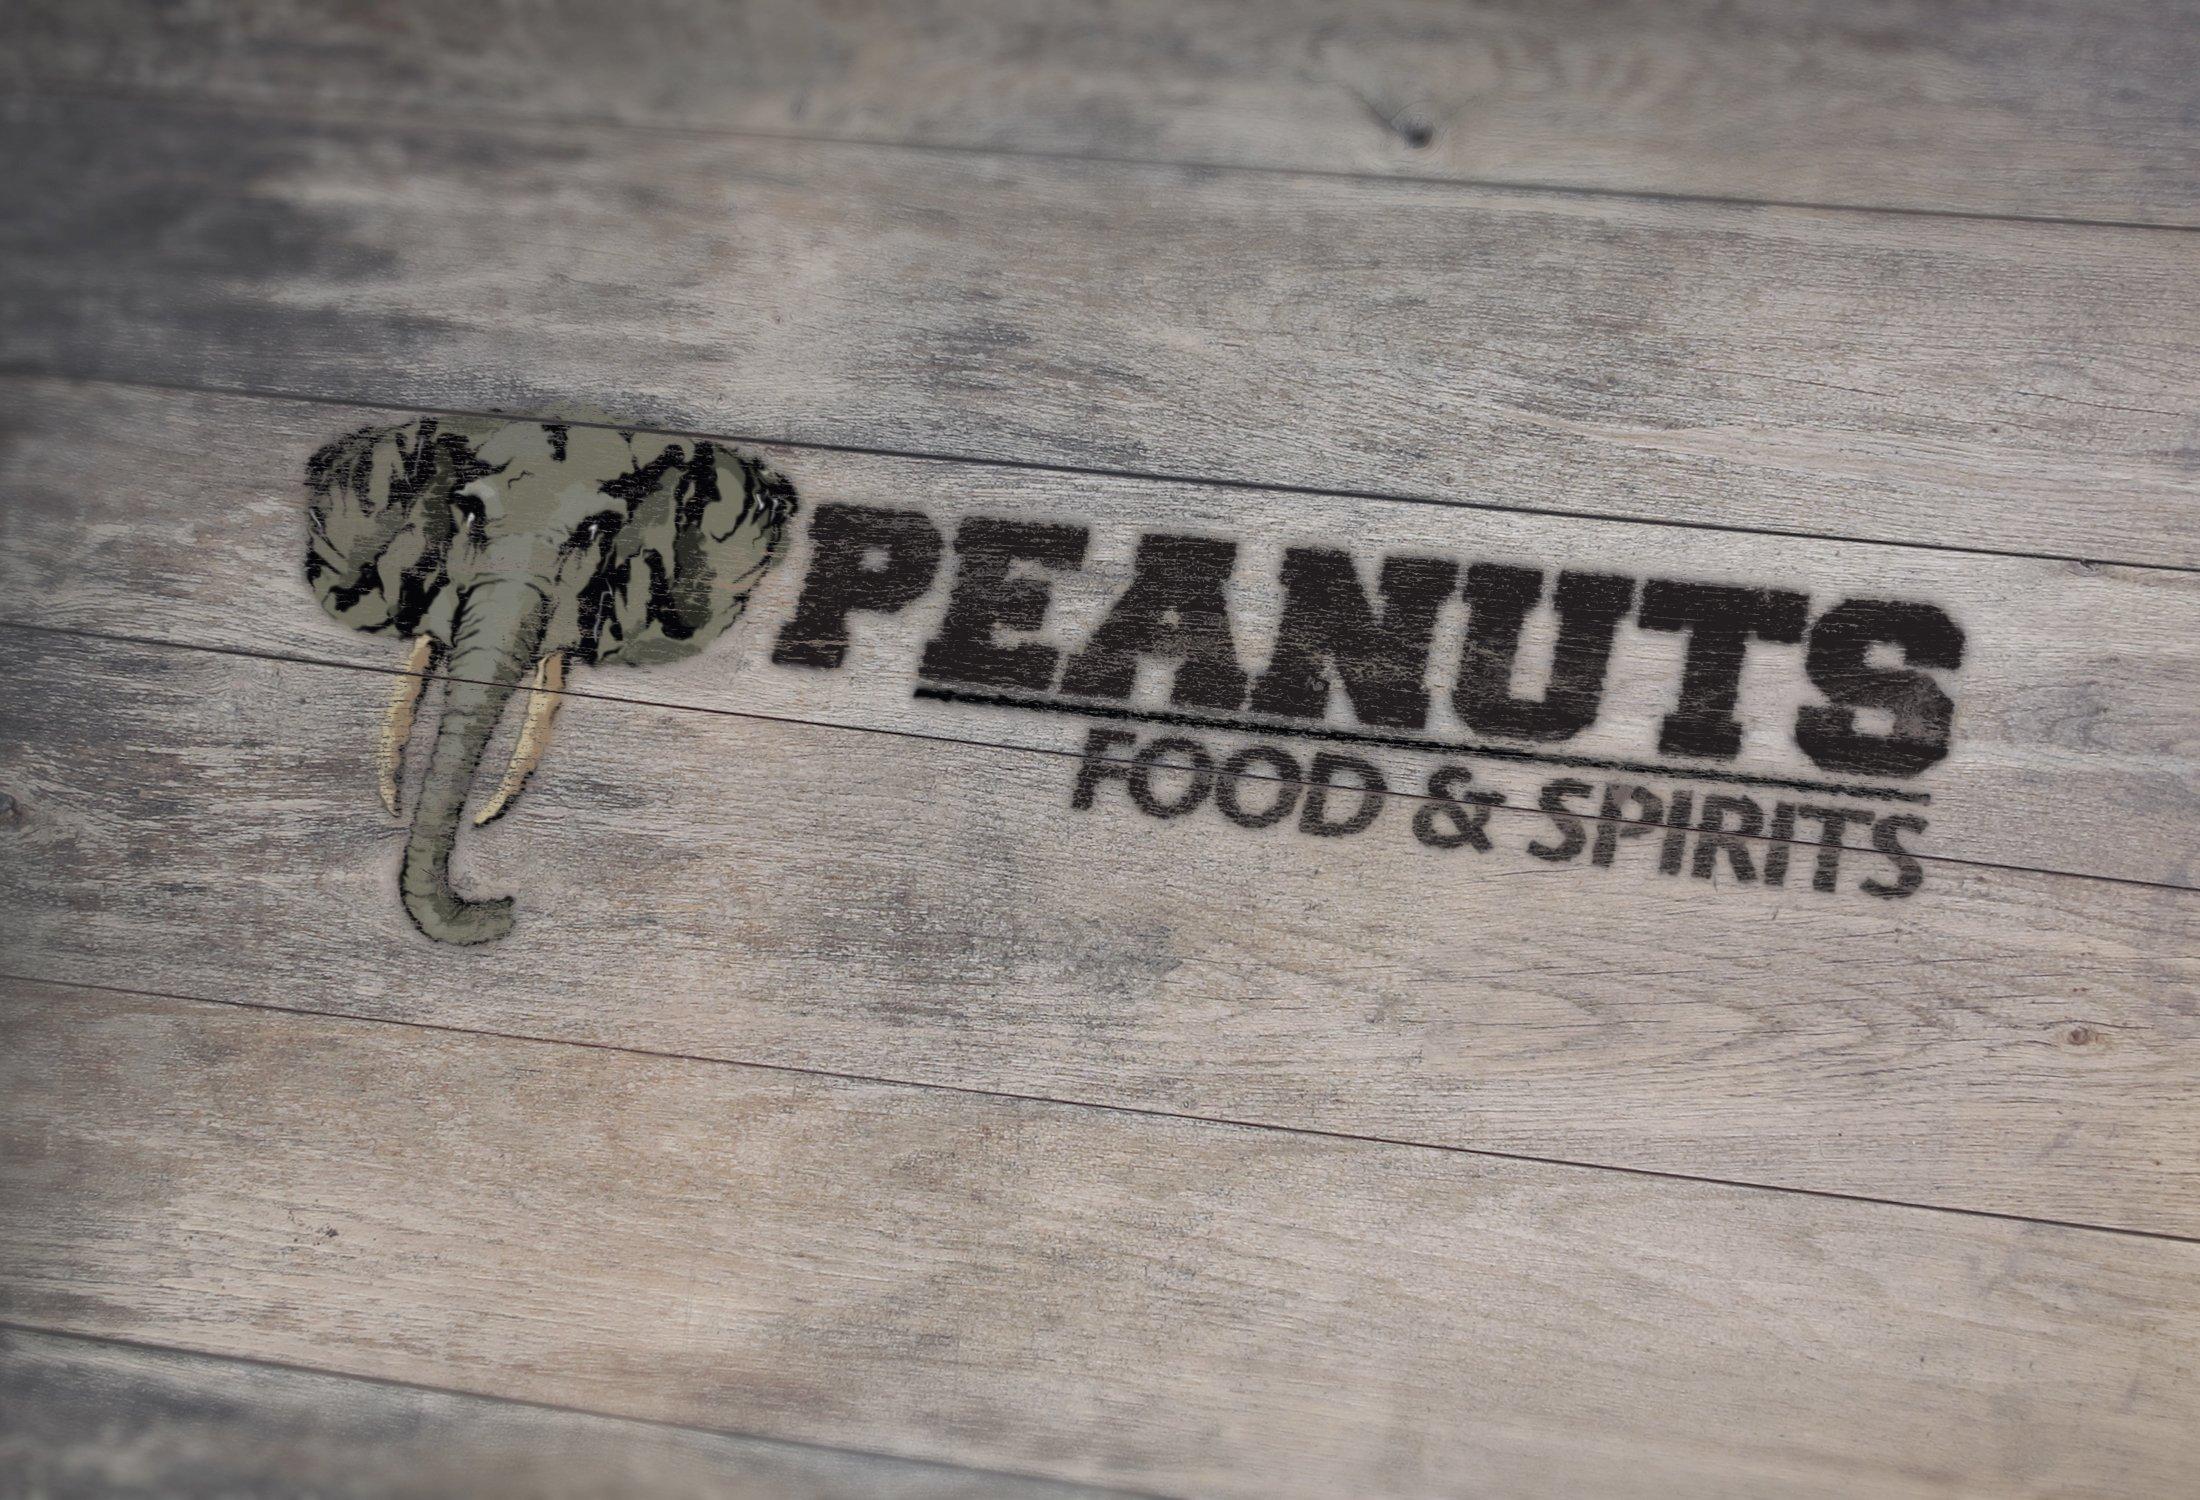 Peanuts Food and Spirits Logo Design